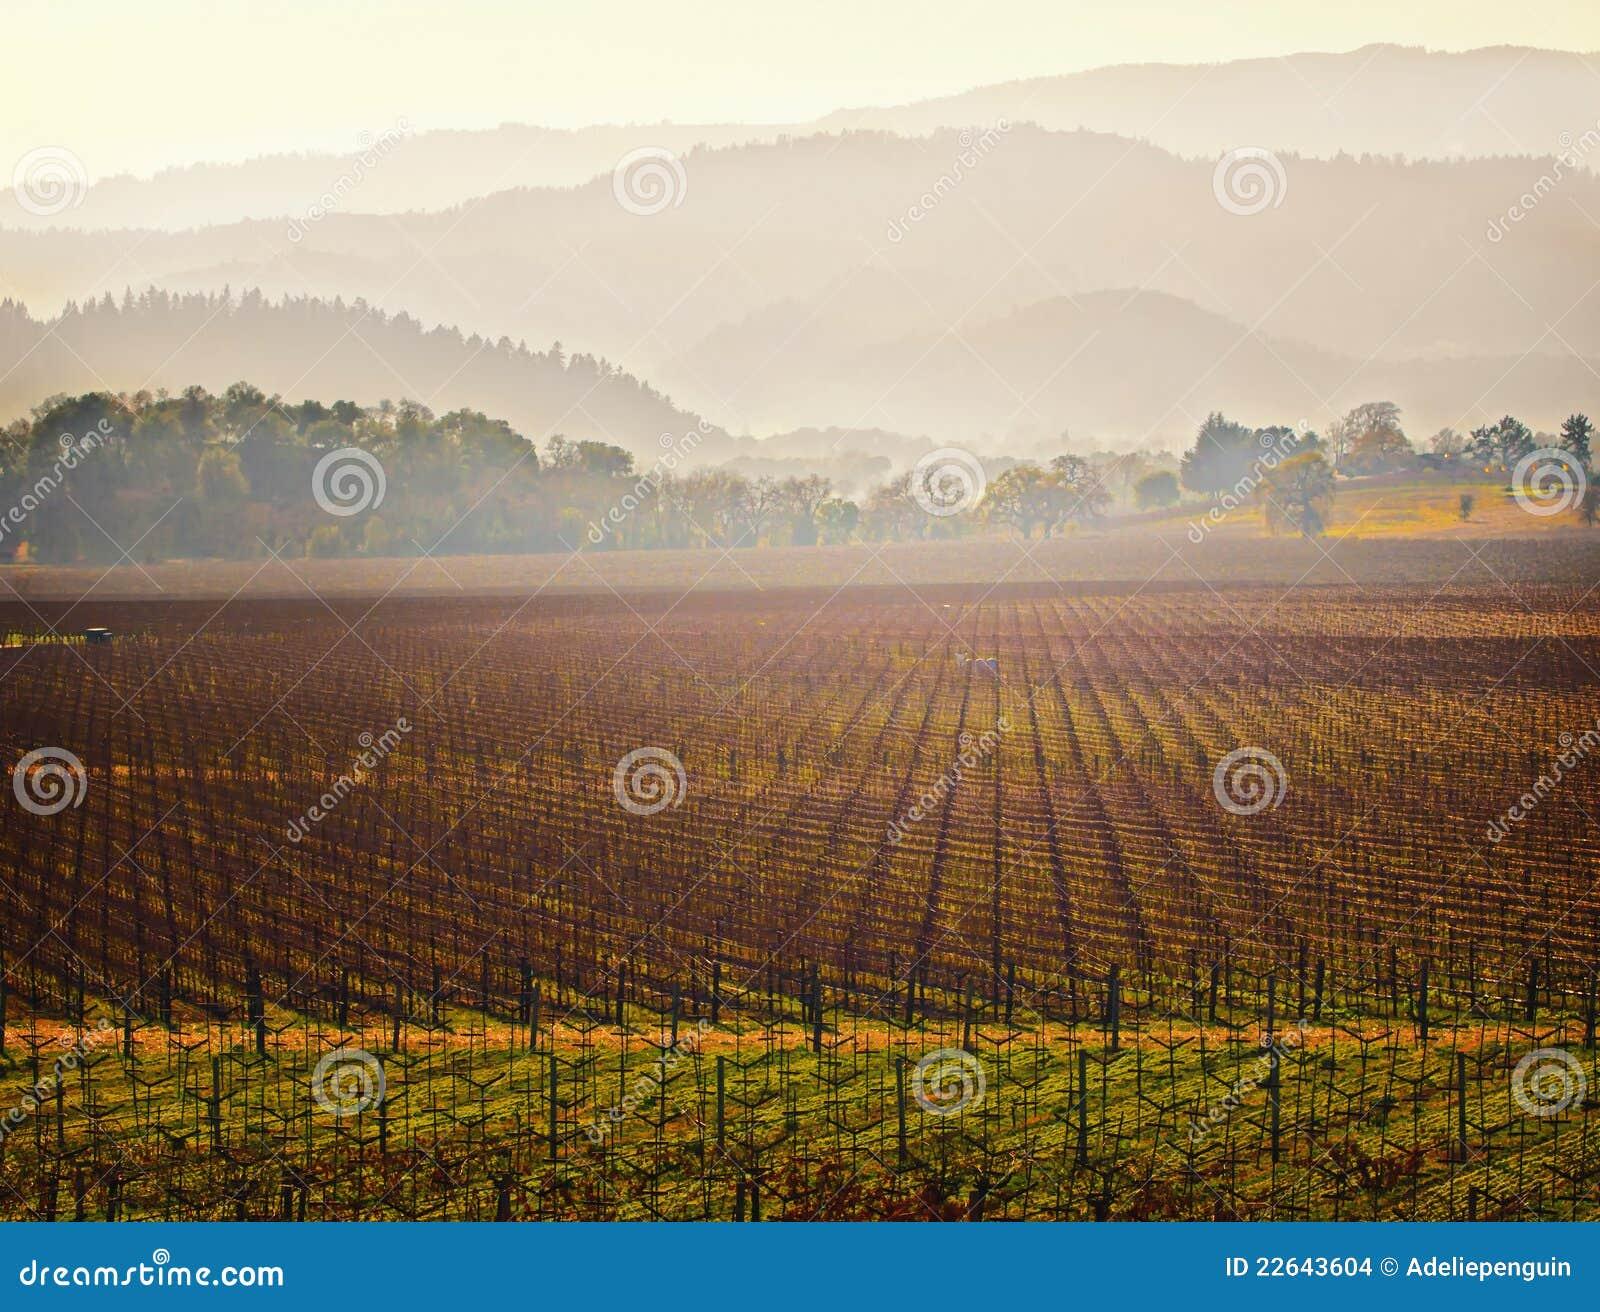 Vineyard, Napa Valley Wine Country, California